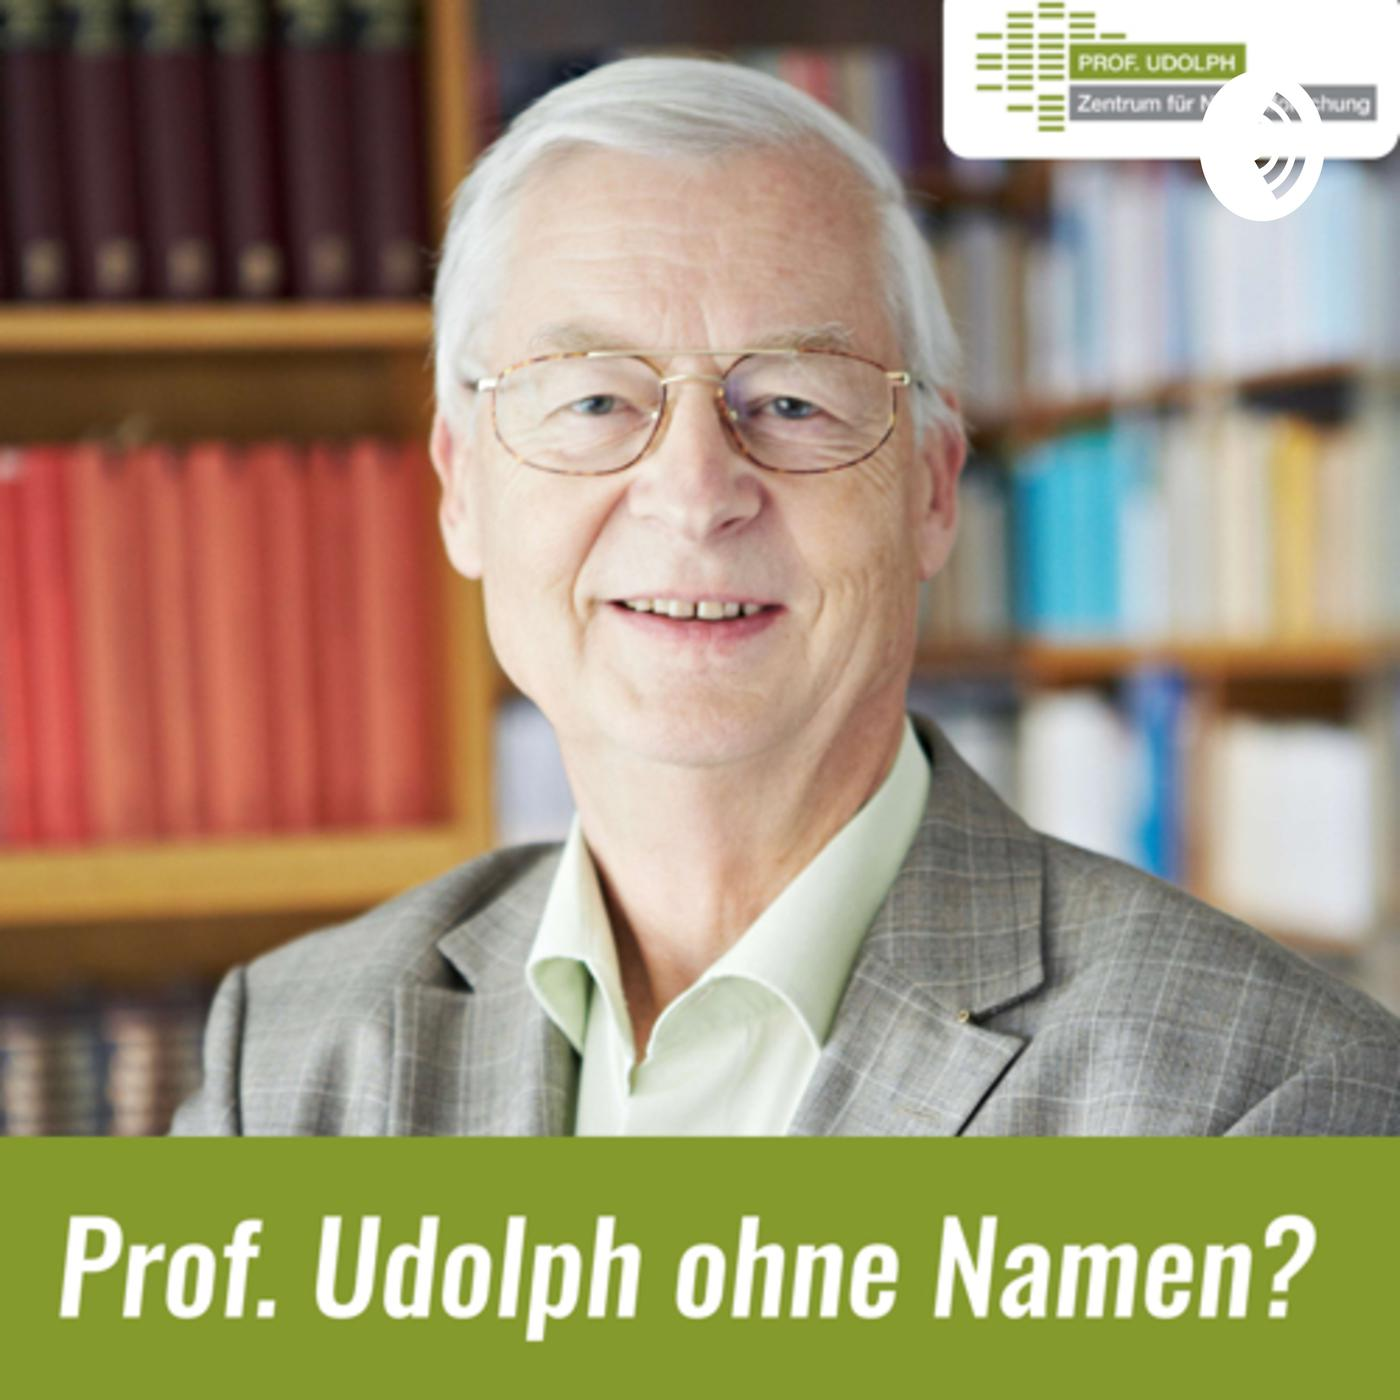 Prof. Udolph